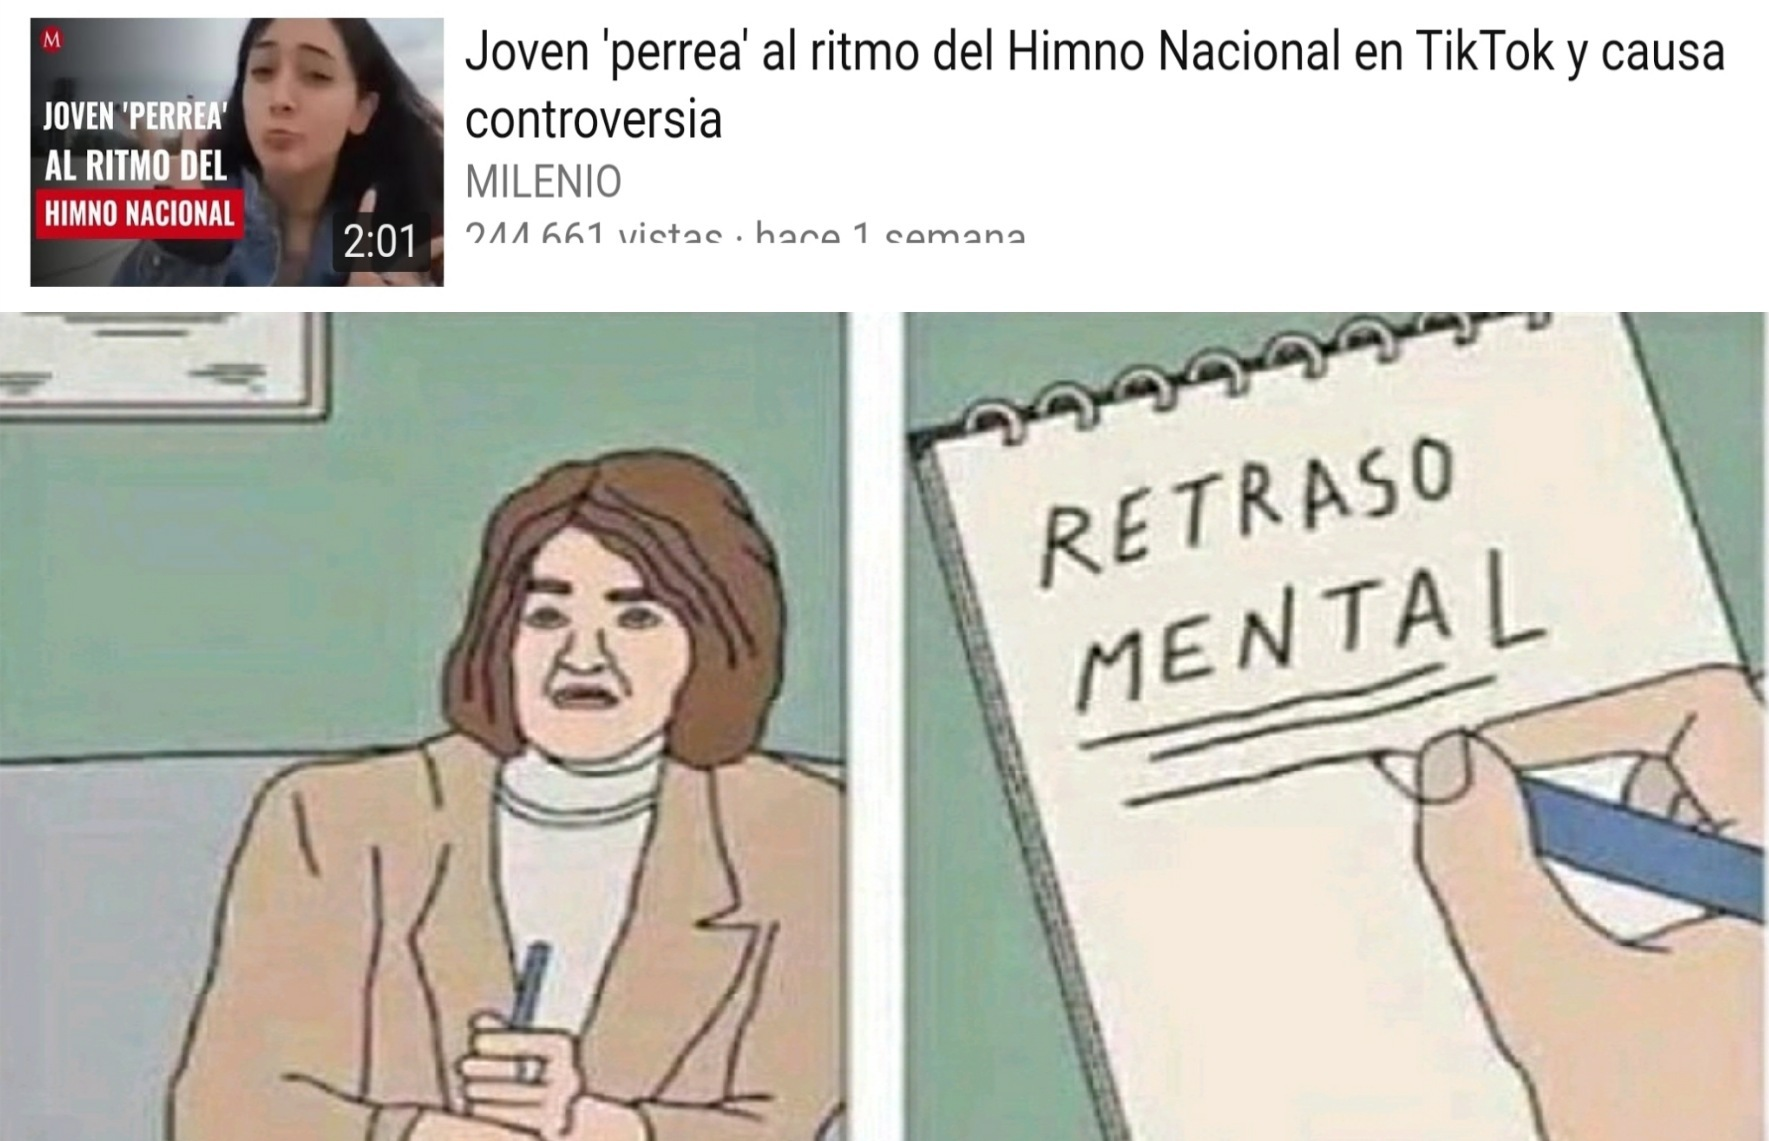 Retraso mental - meme